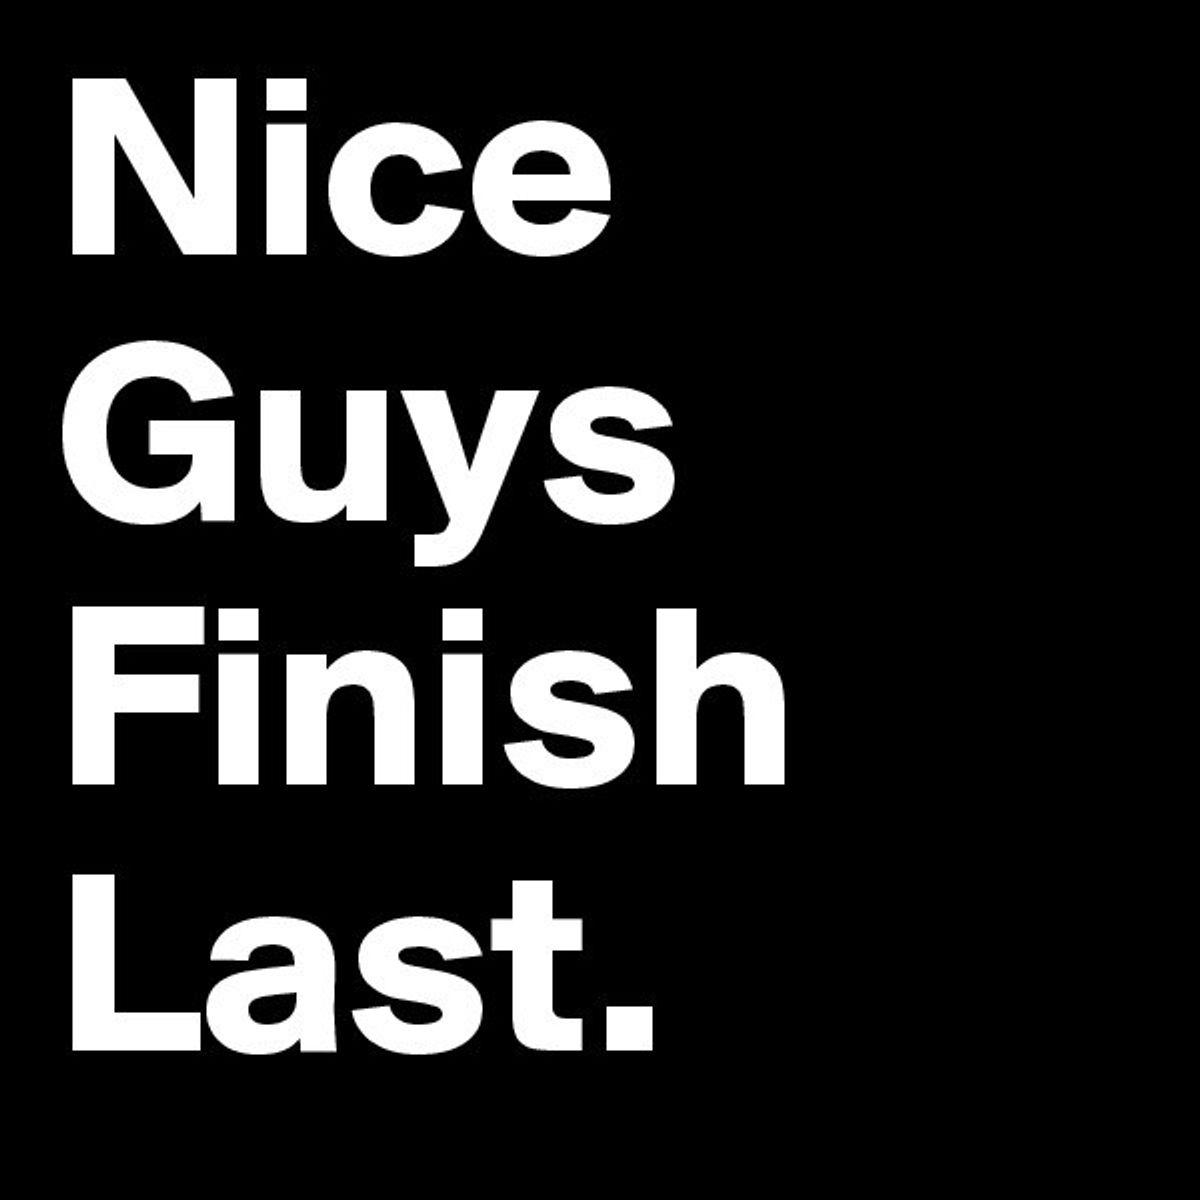 Five Reasons Why Nice Guys Finish Last